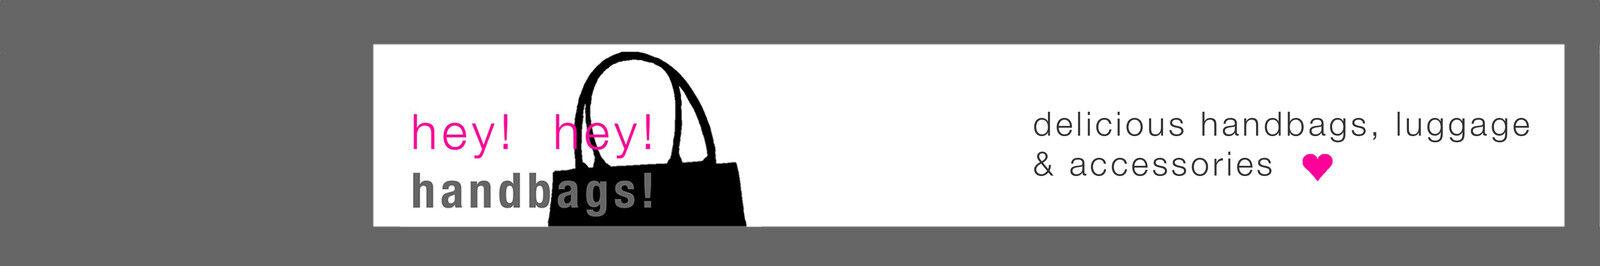 hey hey handbags